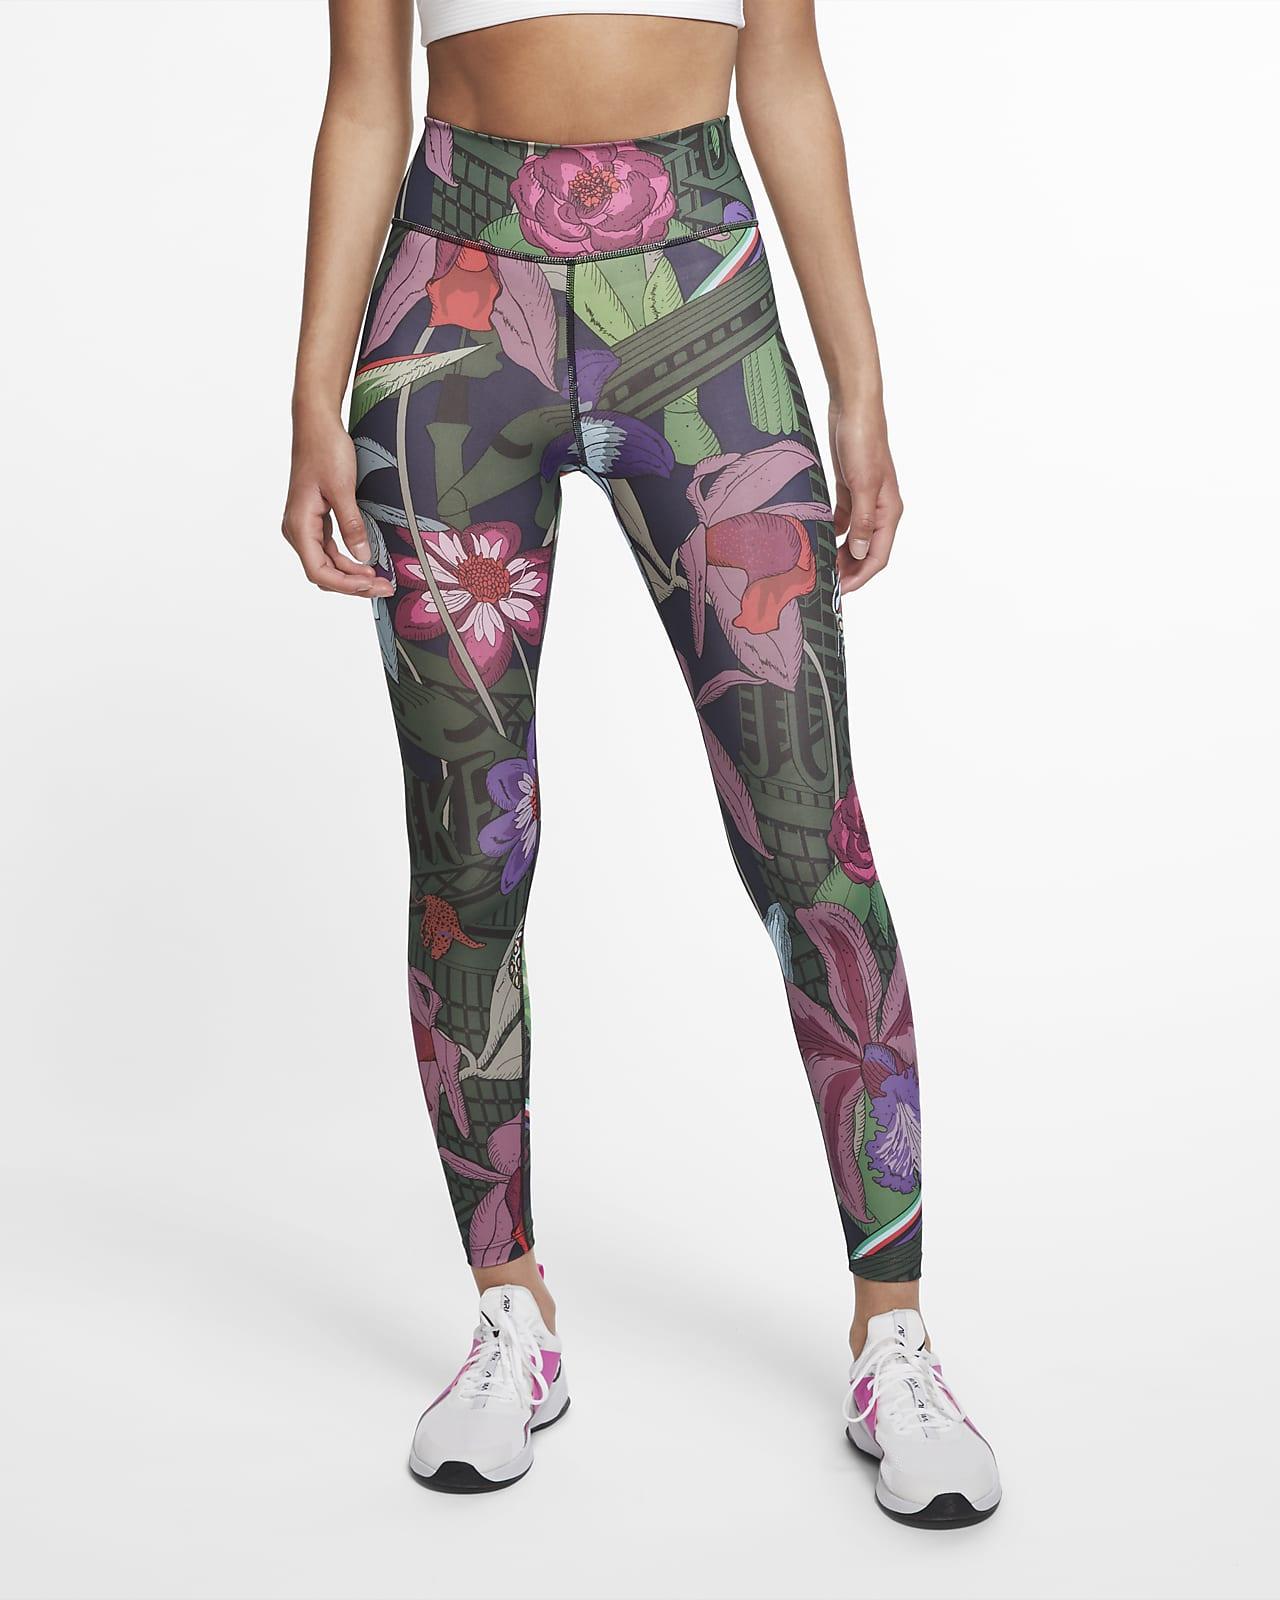 Nike One Icon Clash Women's Printed Leggings